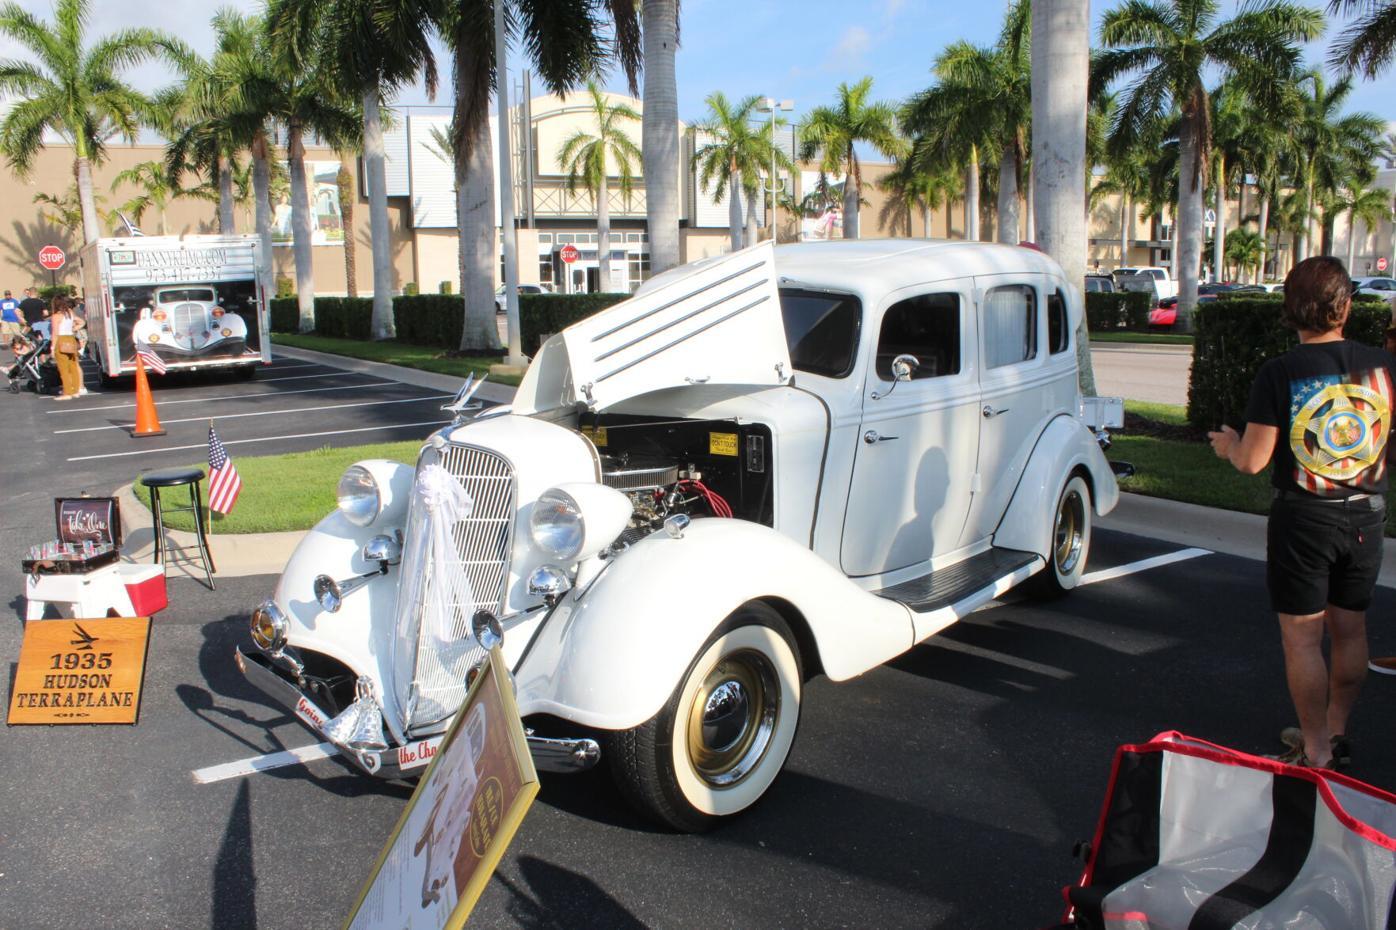 1935 Hudson Terraplane wedding car